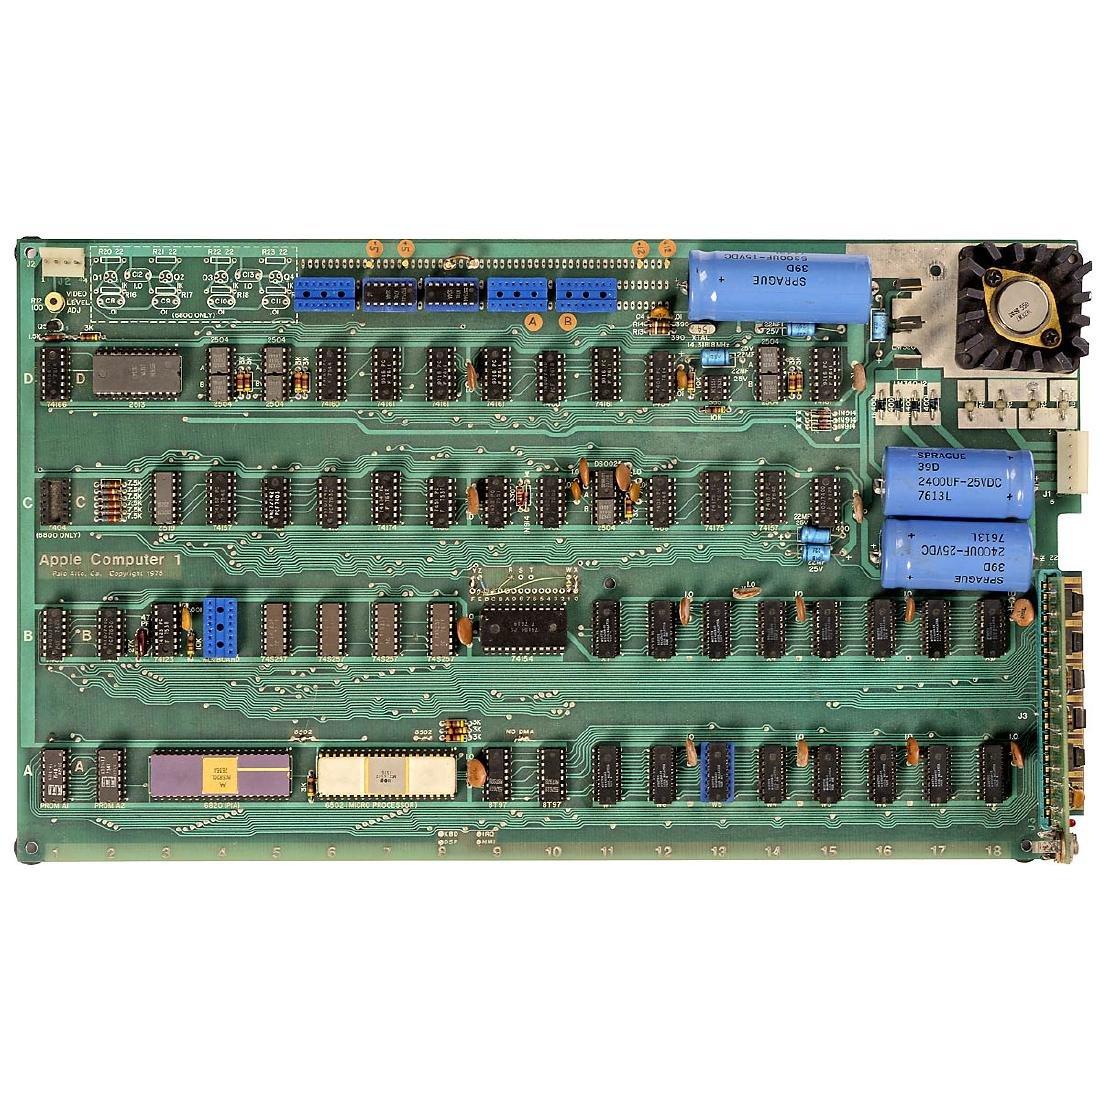 Original Apple-1 Computer, 1976 - 3